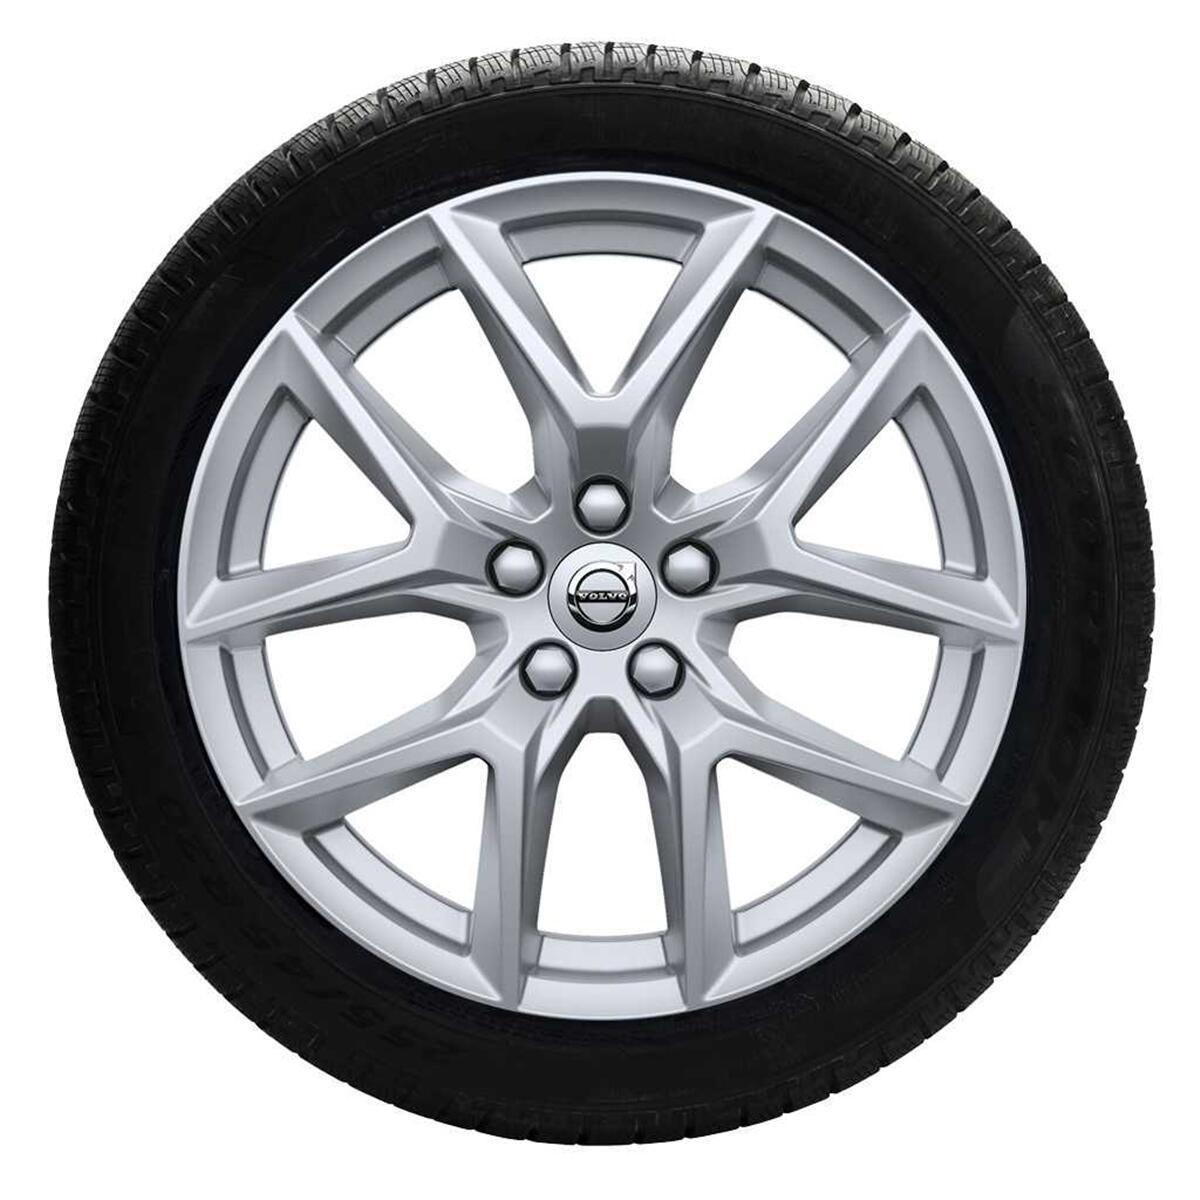 komplet zimskih točkova: 18'', gume Pirelli